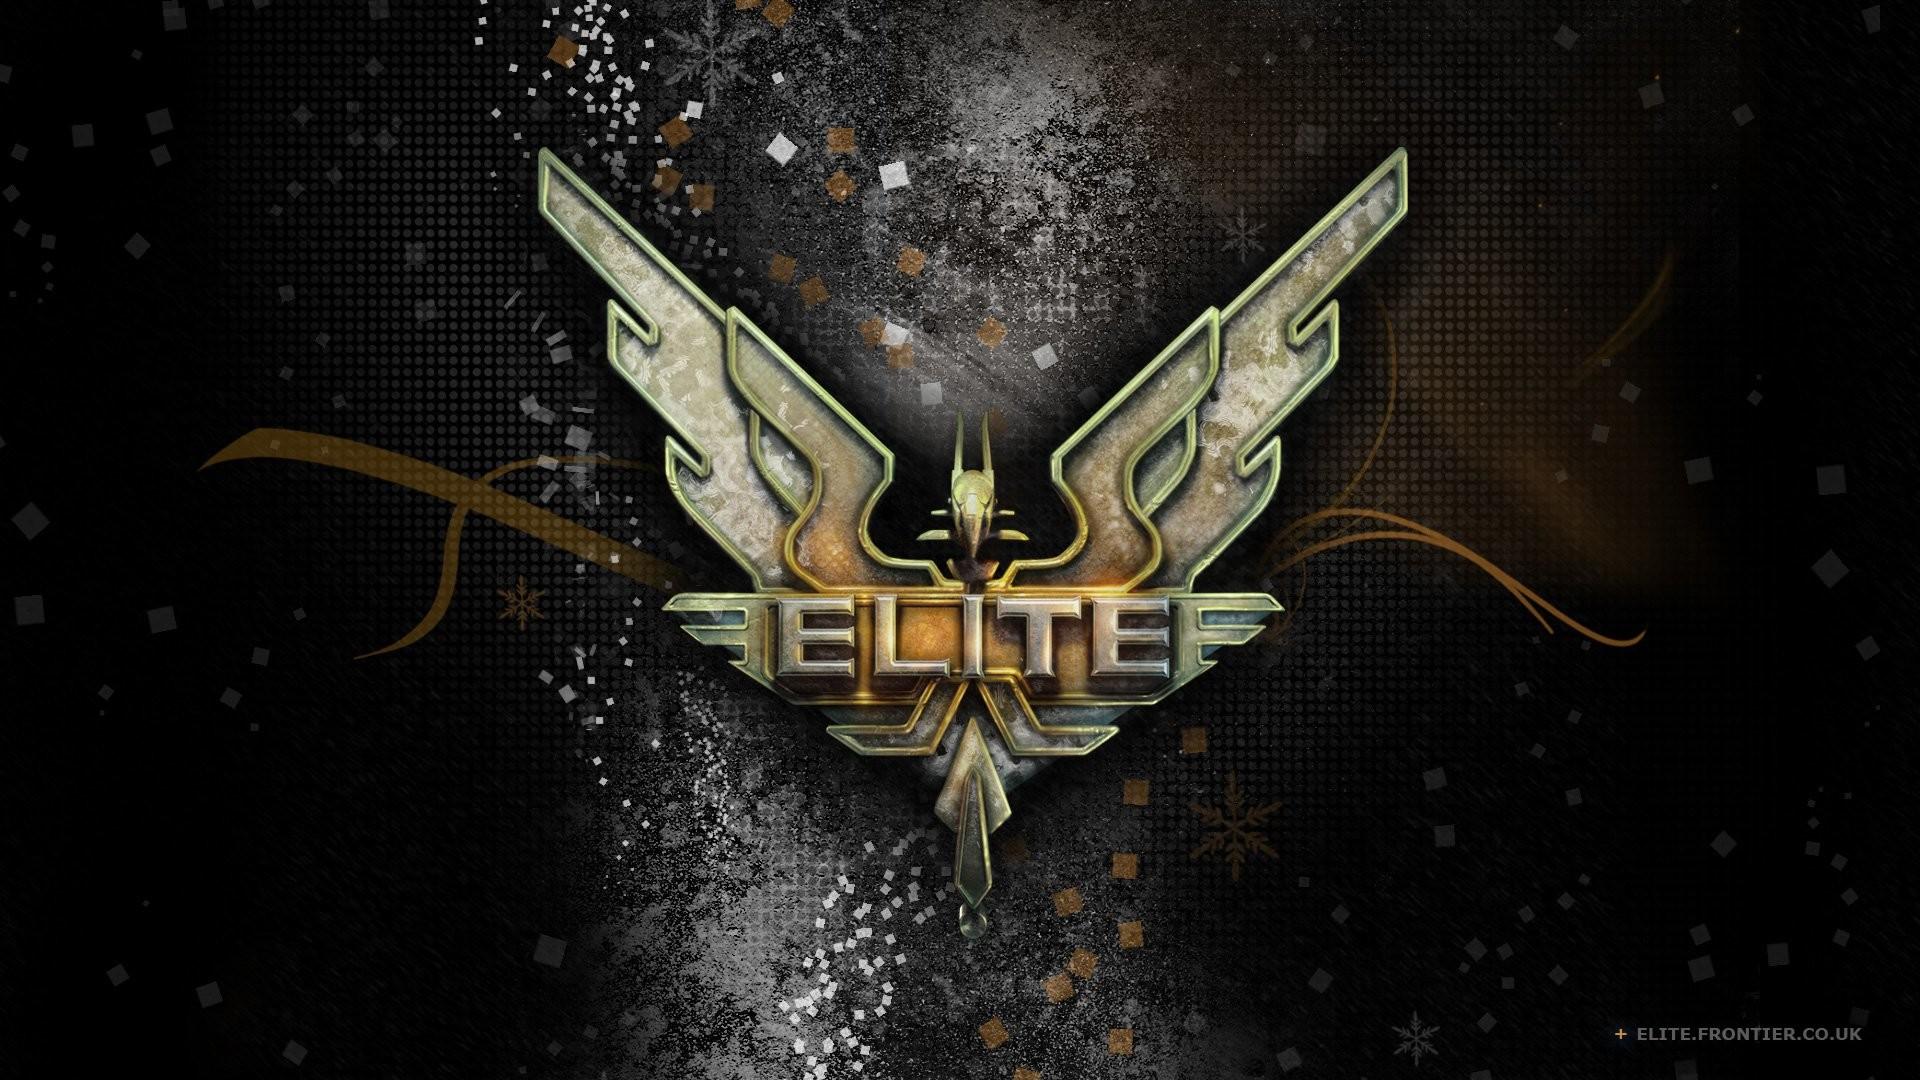 Elite Dangerous 4K Wallpaper (66+ images)